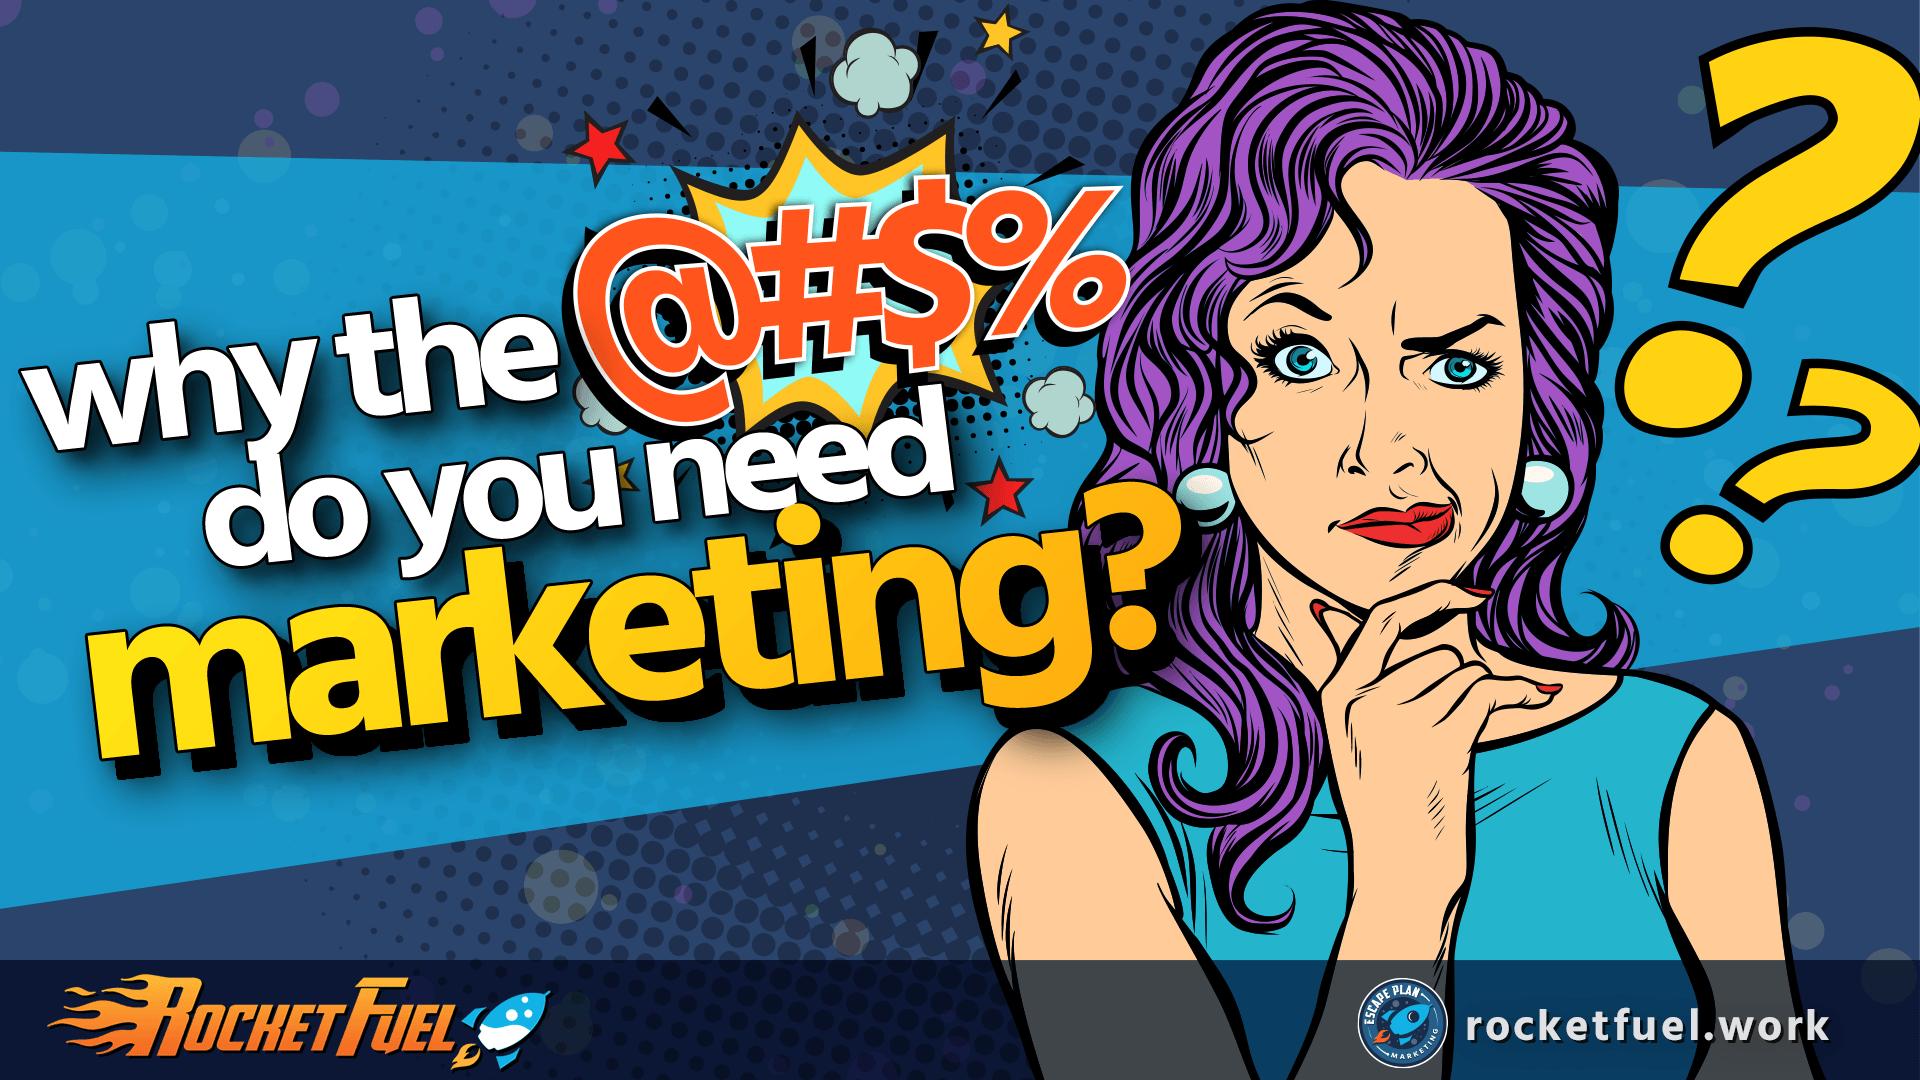 Why Do You Need Marketing?